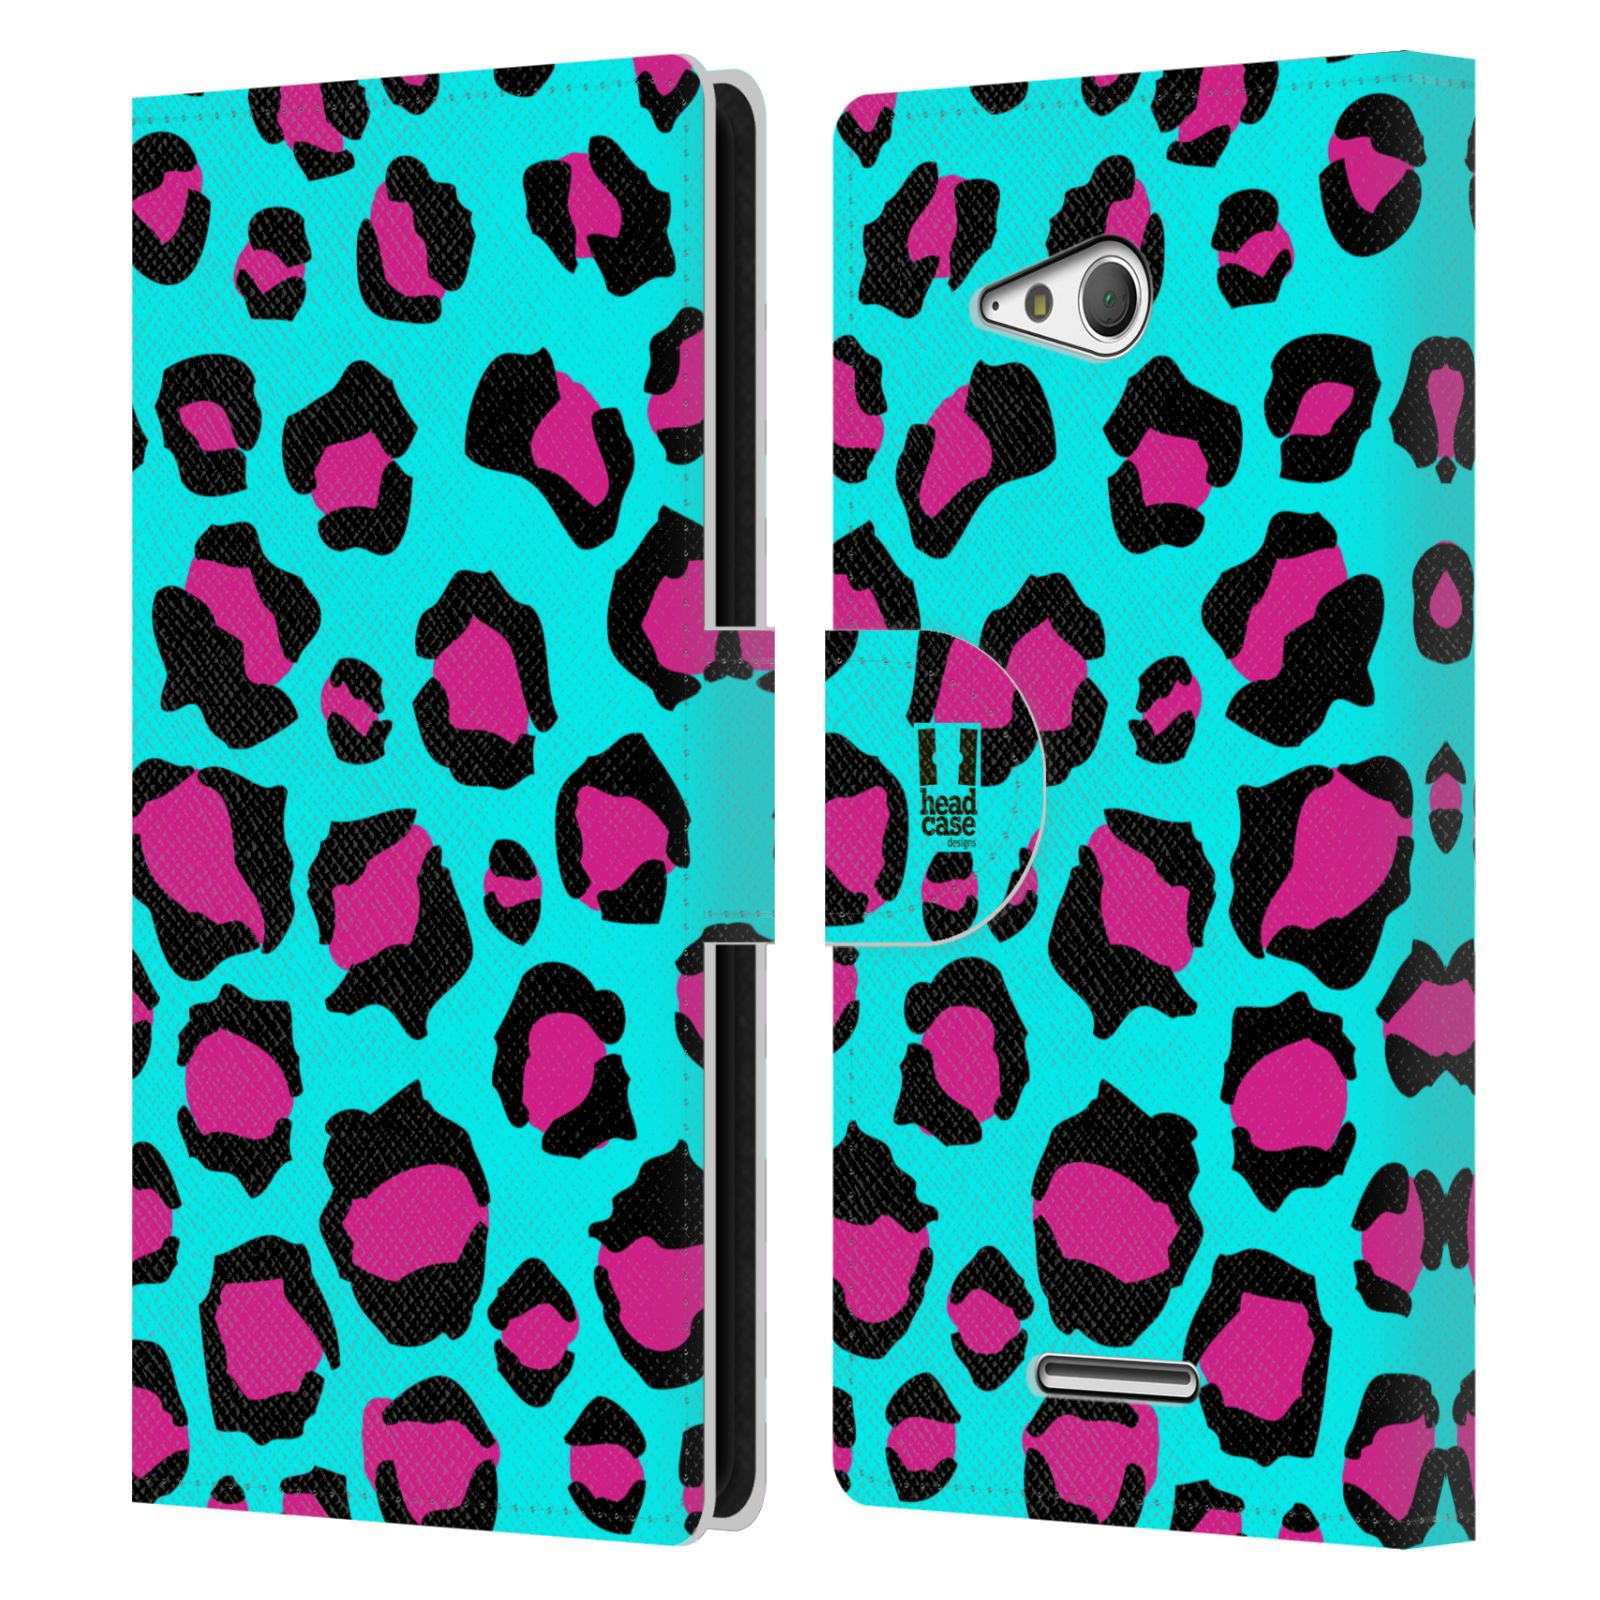 HEAD CASE Flipové pouzdro pro mobil SONY XPERIA E4g Zvířecí barevné vzory tyrkysový leopard